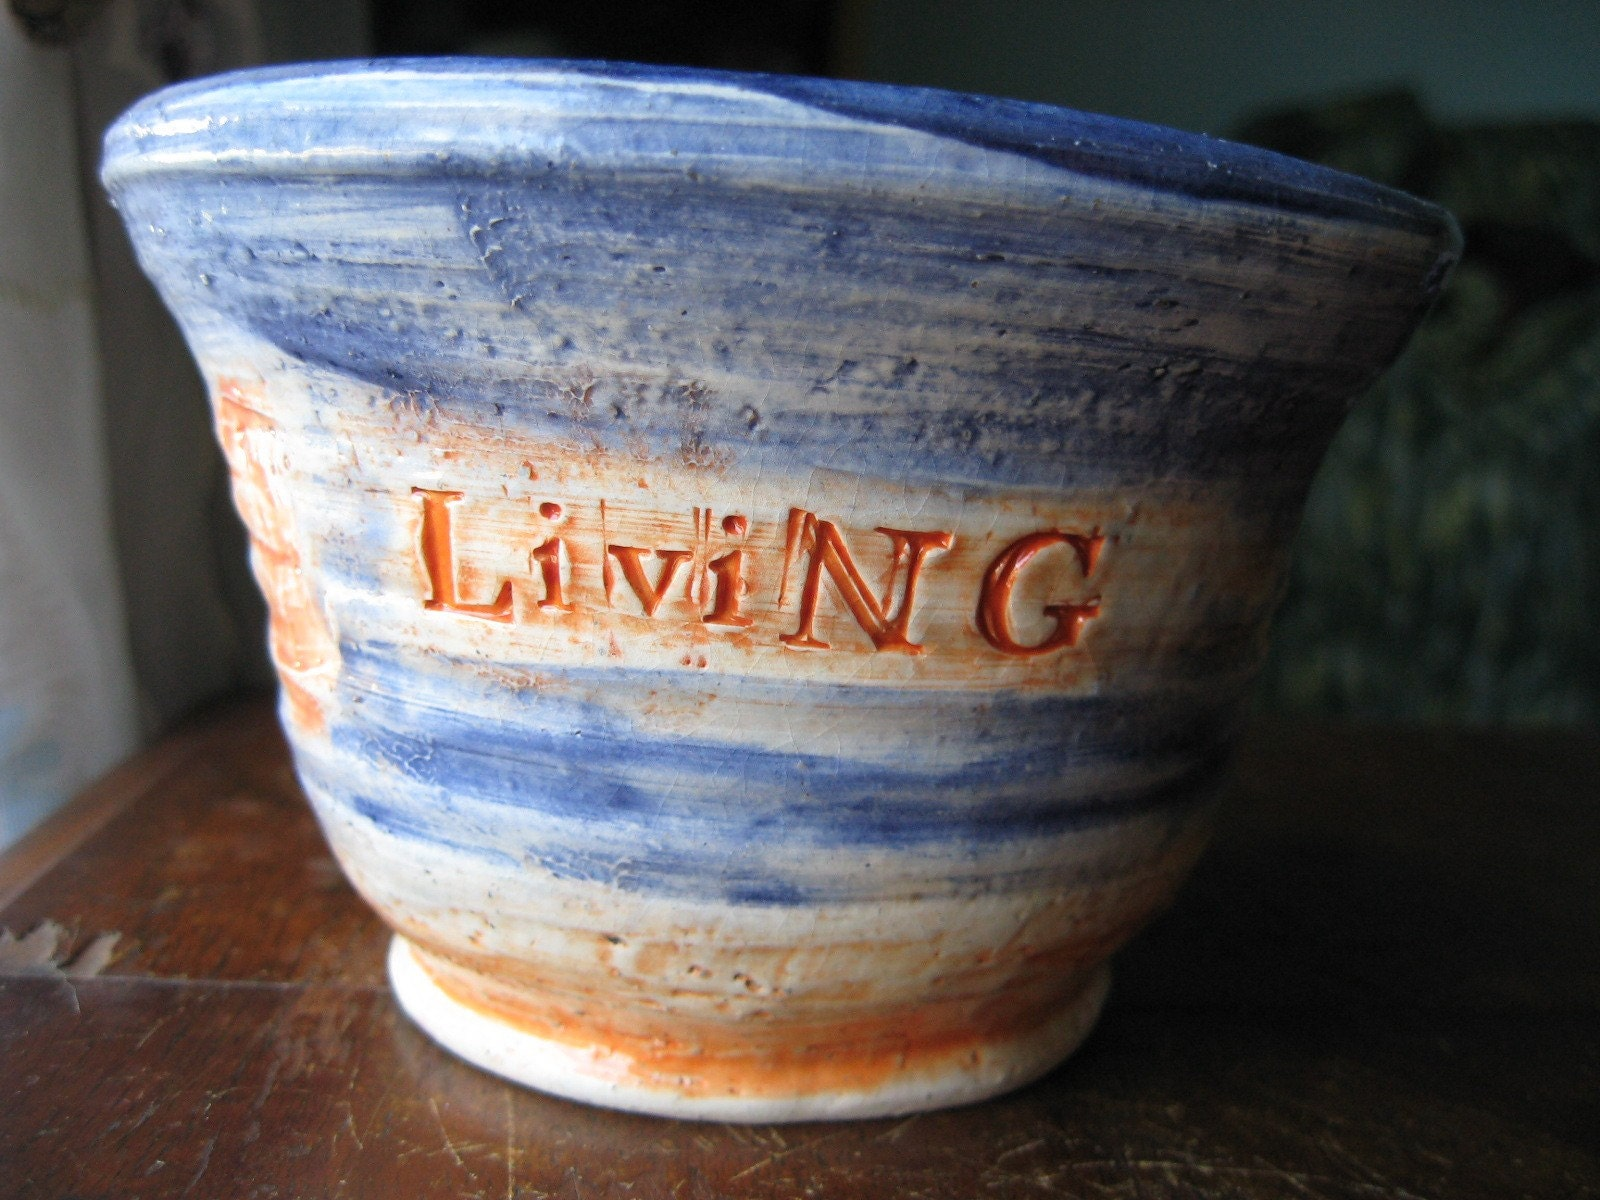 Living The Fantasy heart bowl